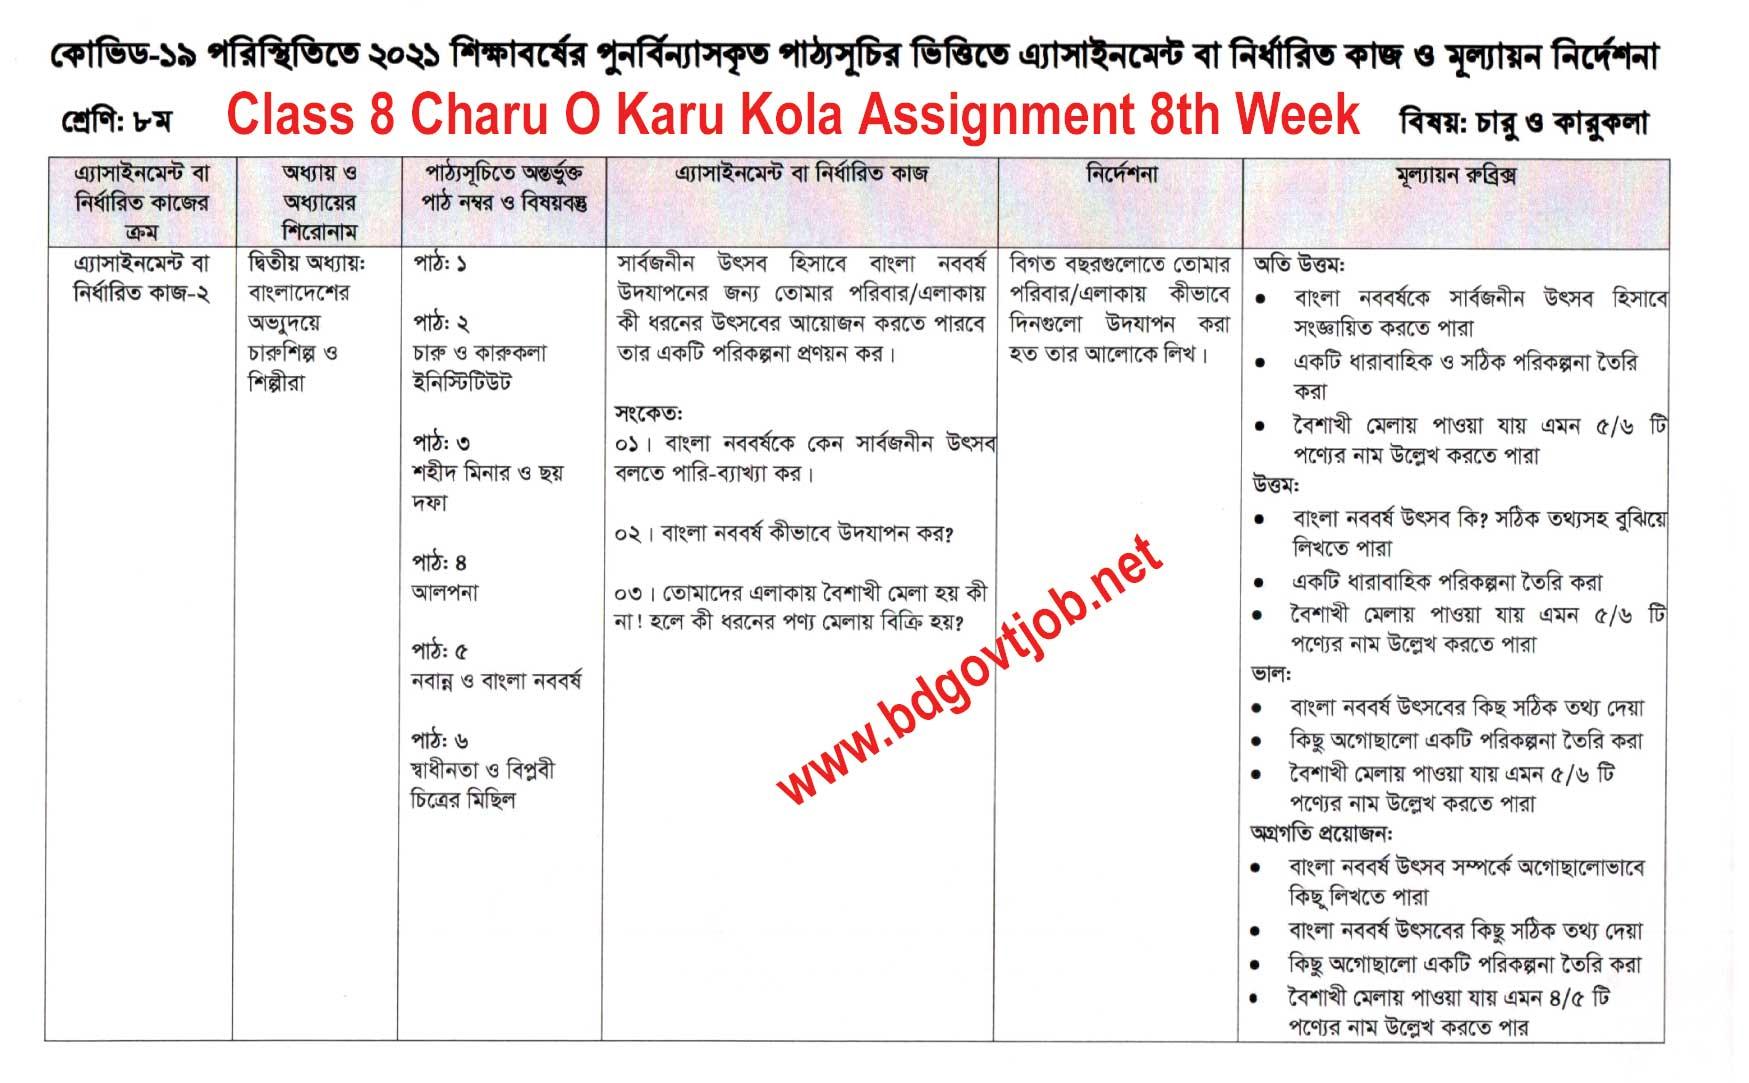 Class 8 Charu o Karukola Assignment 8th Week